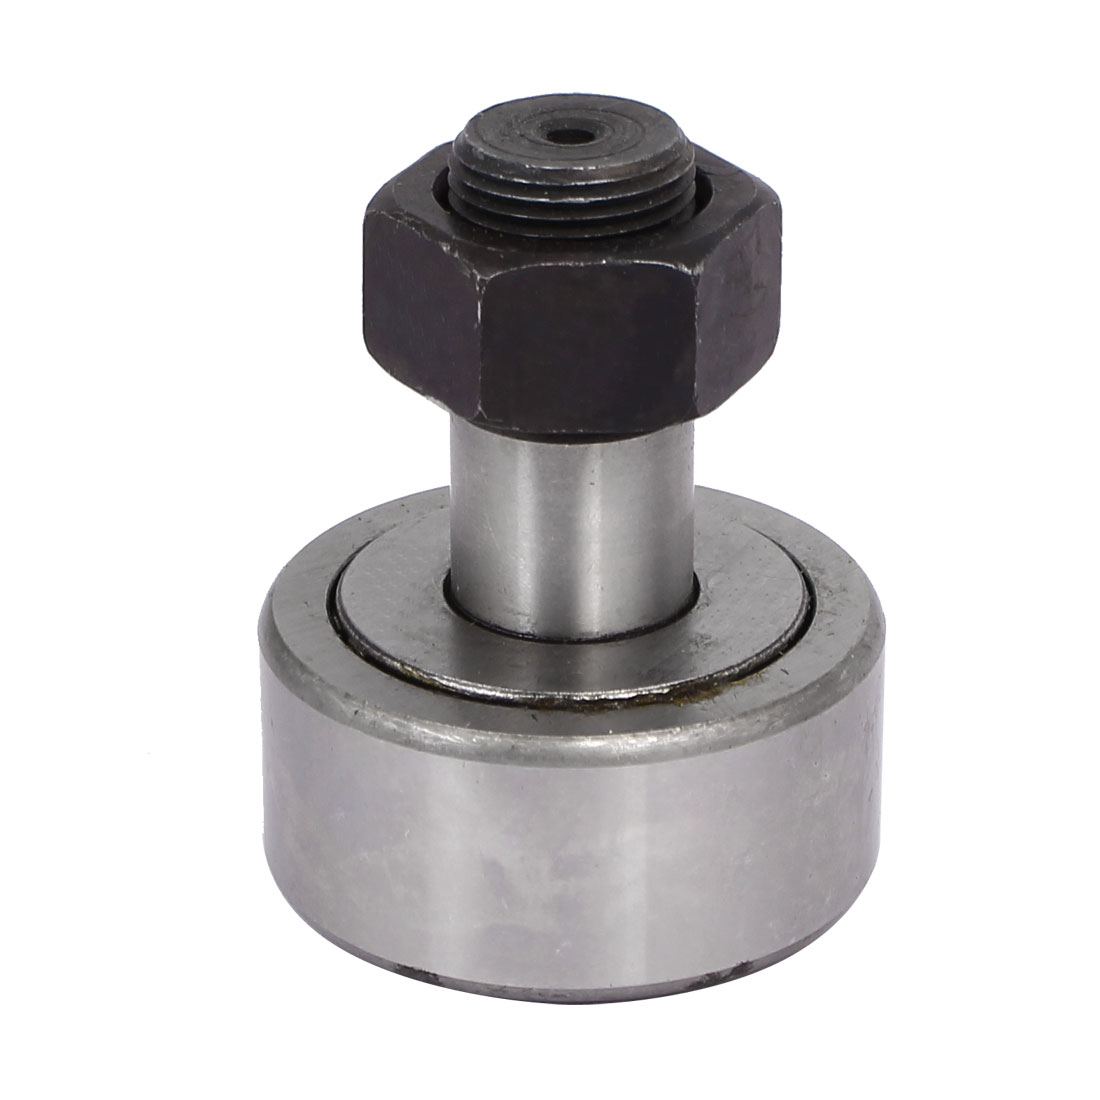 CF20 Single Row Cam Follower Bolt Type Needle Roller Ball Bearing w Hex Nut na4910 heavy duty needle roller bearing entity needle bearing with inner ring 4524910 size 50 72 22